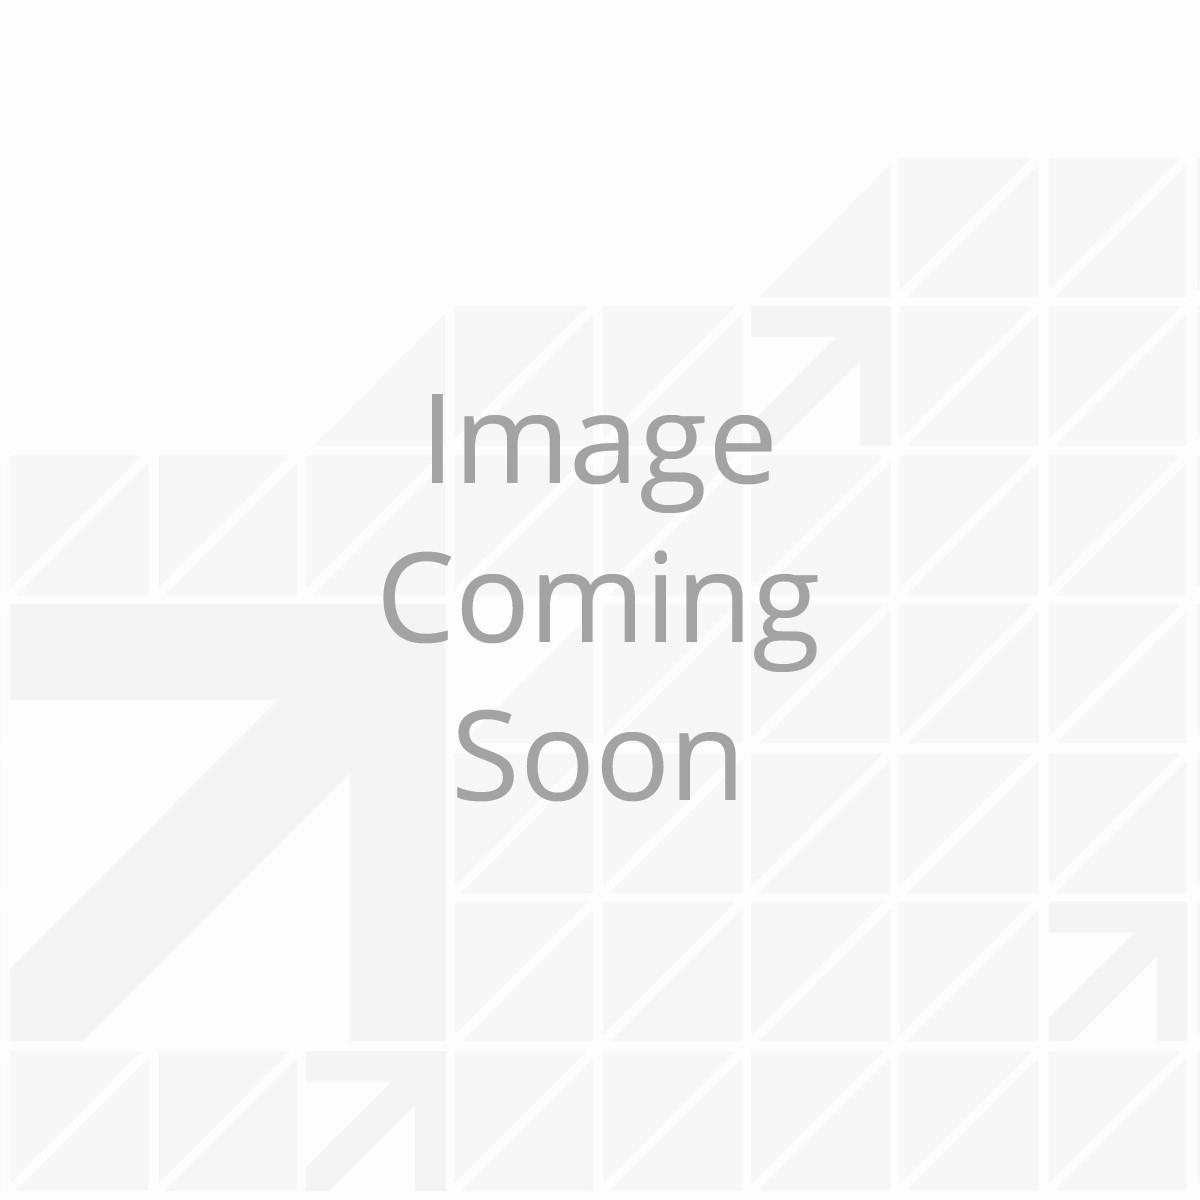 TV Lift Transmitter/Receiver Kit - Lippert™ TV Lifts